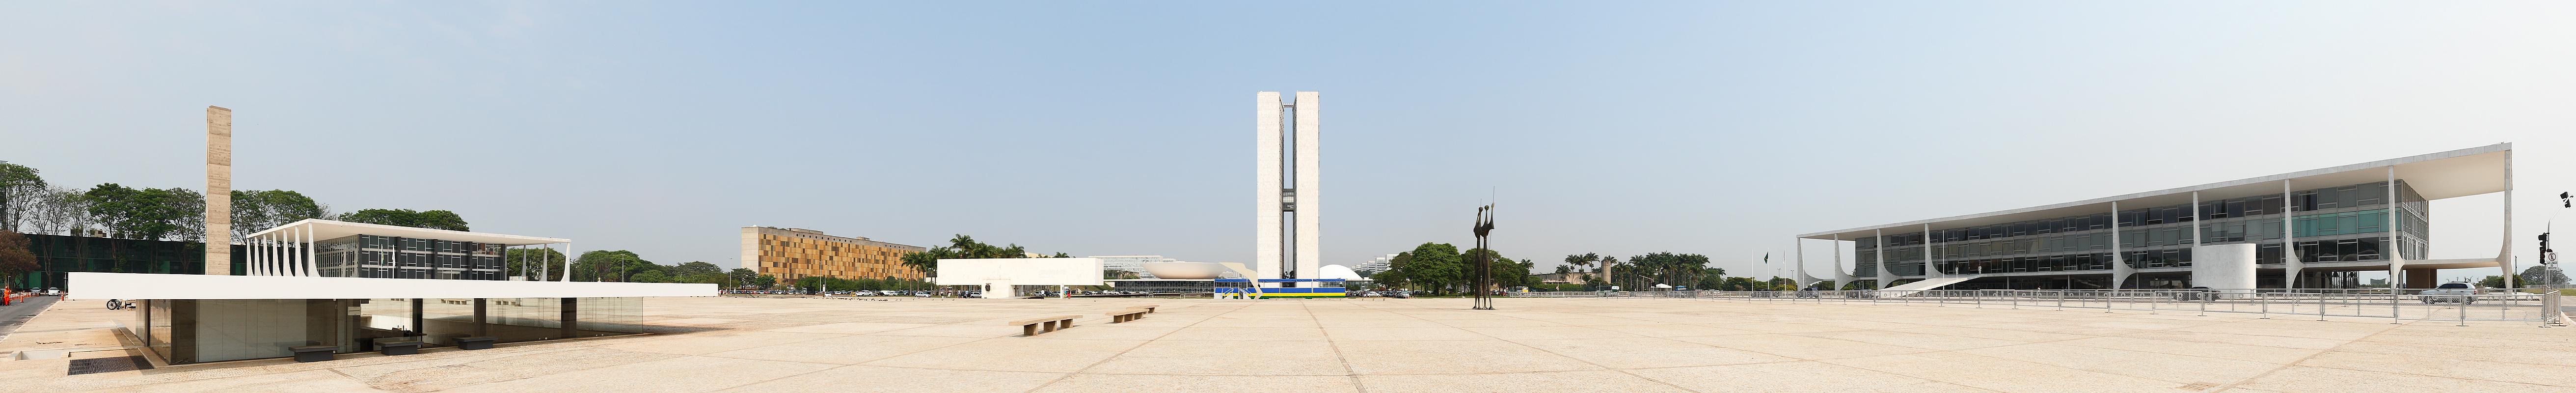 File:Praça 3 Poderes Brasília panorama.jpg